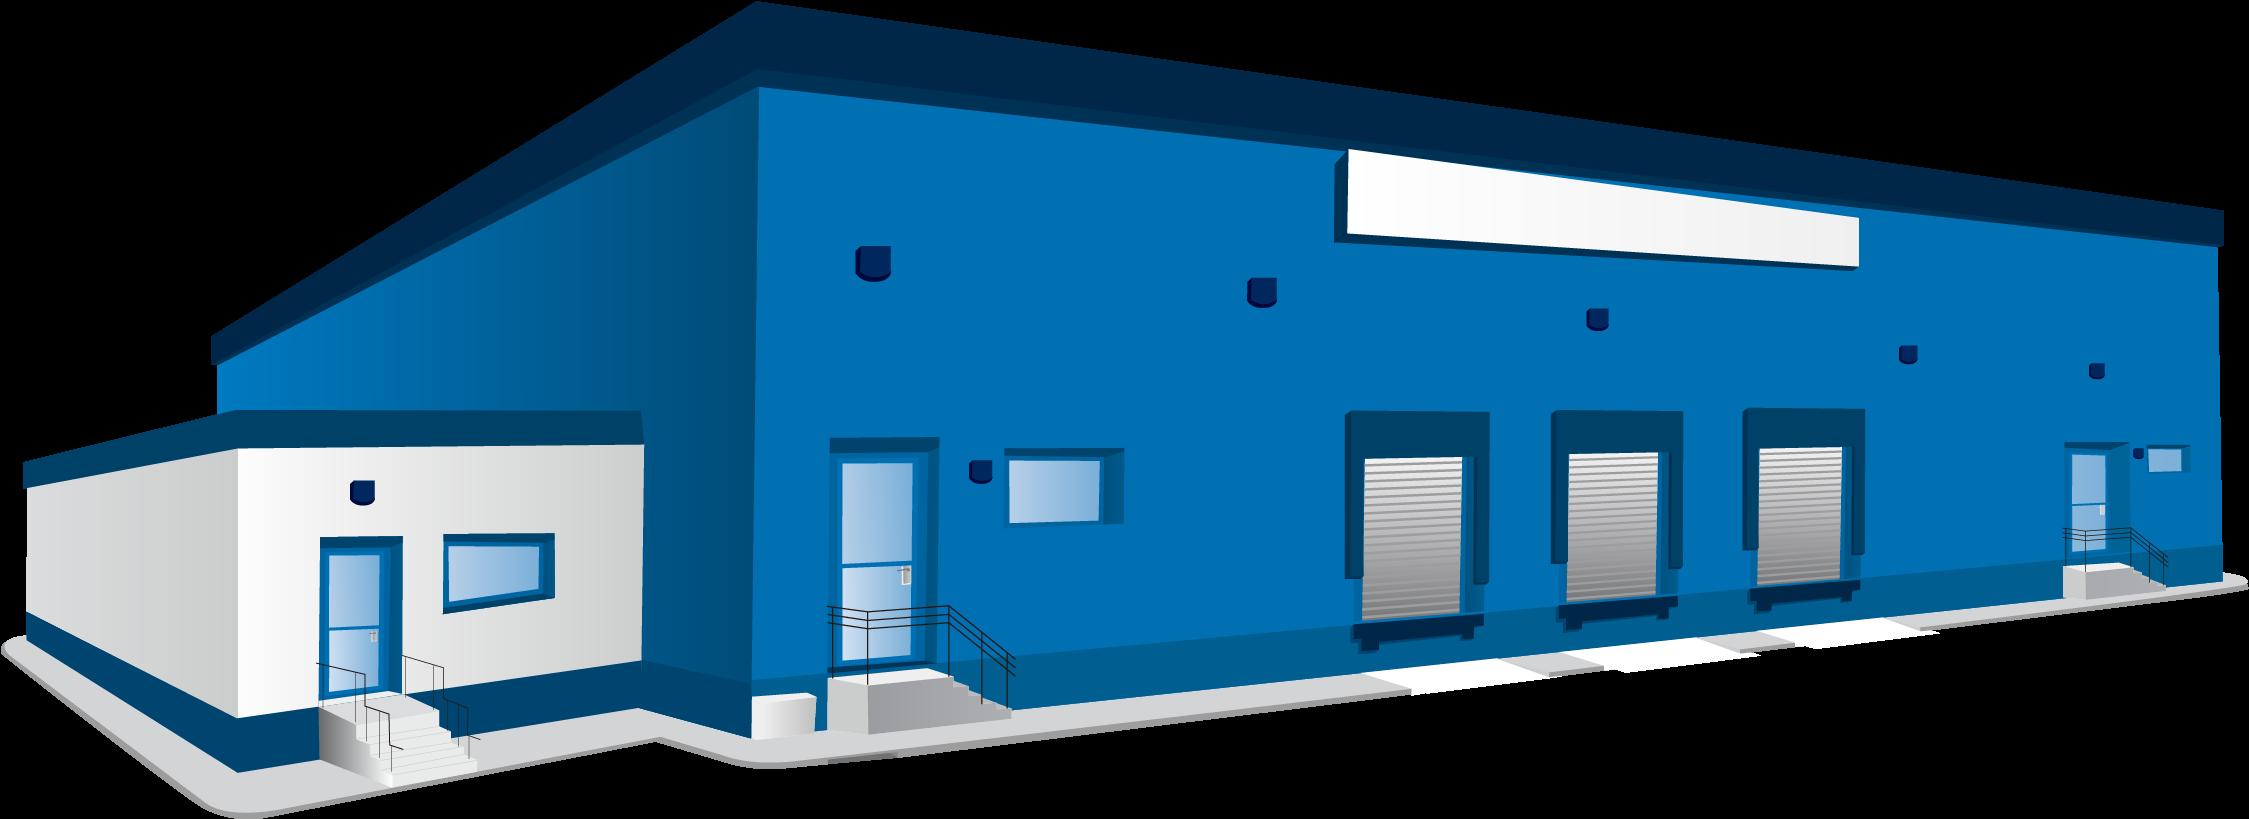 Industrial buildings clipart jpg download Building Architectural Engineering Clip Art - Factory Building ... jpg download